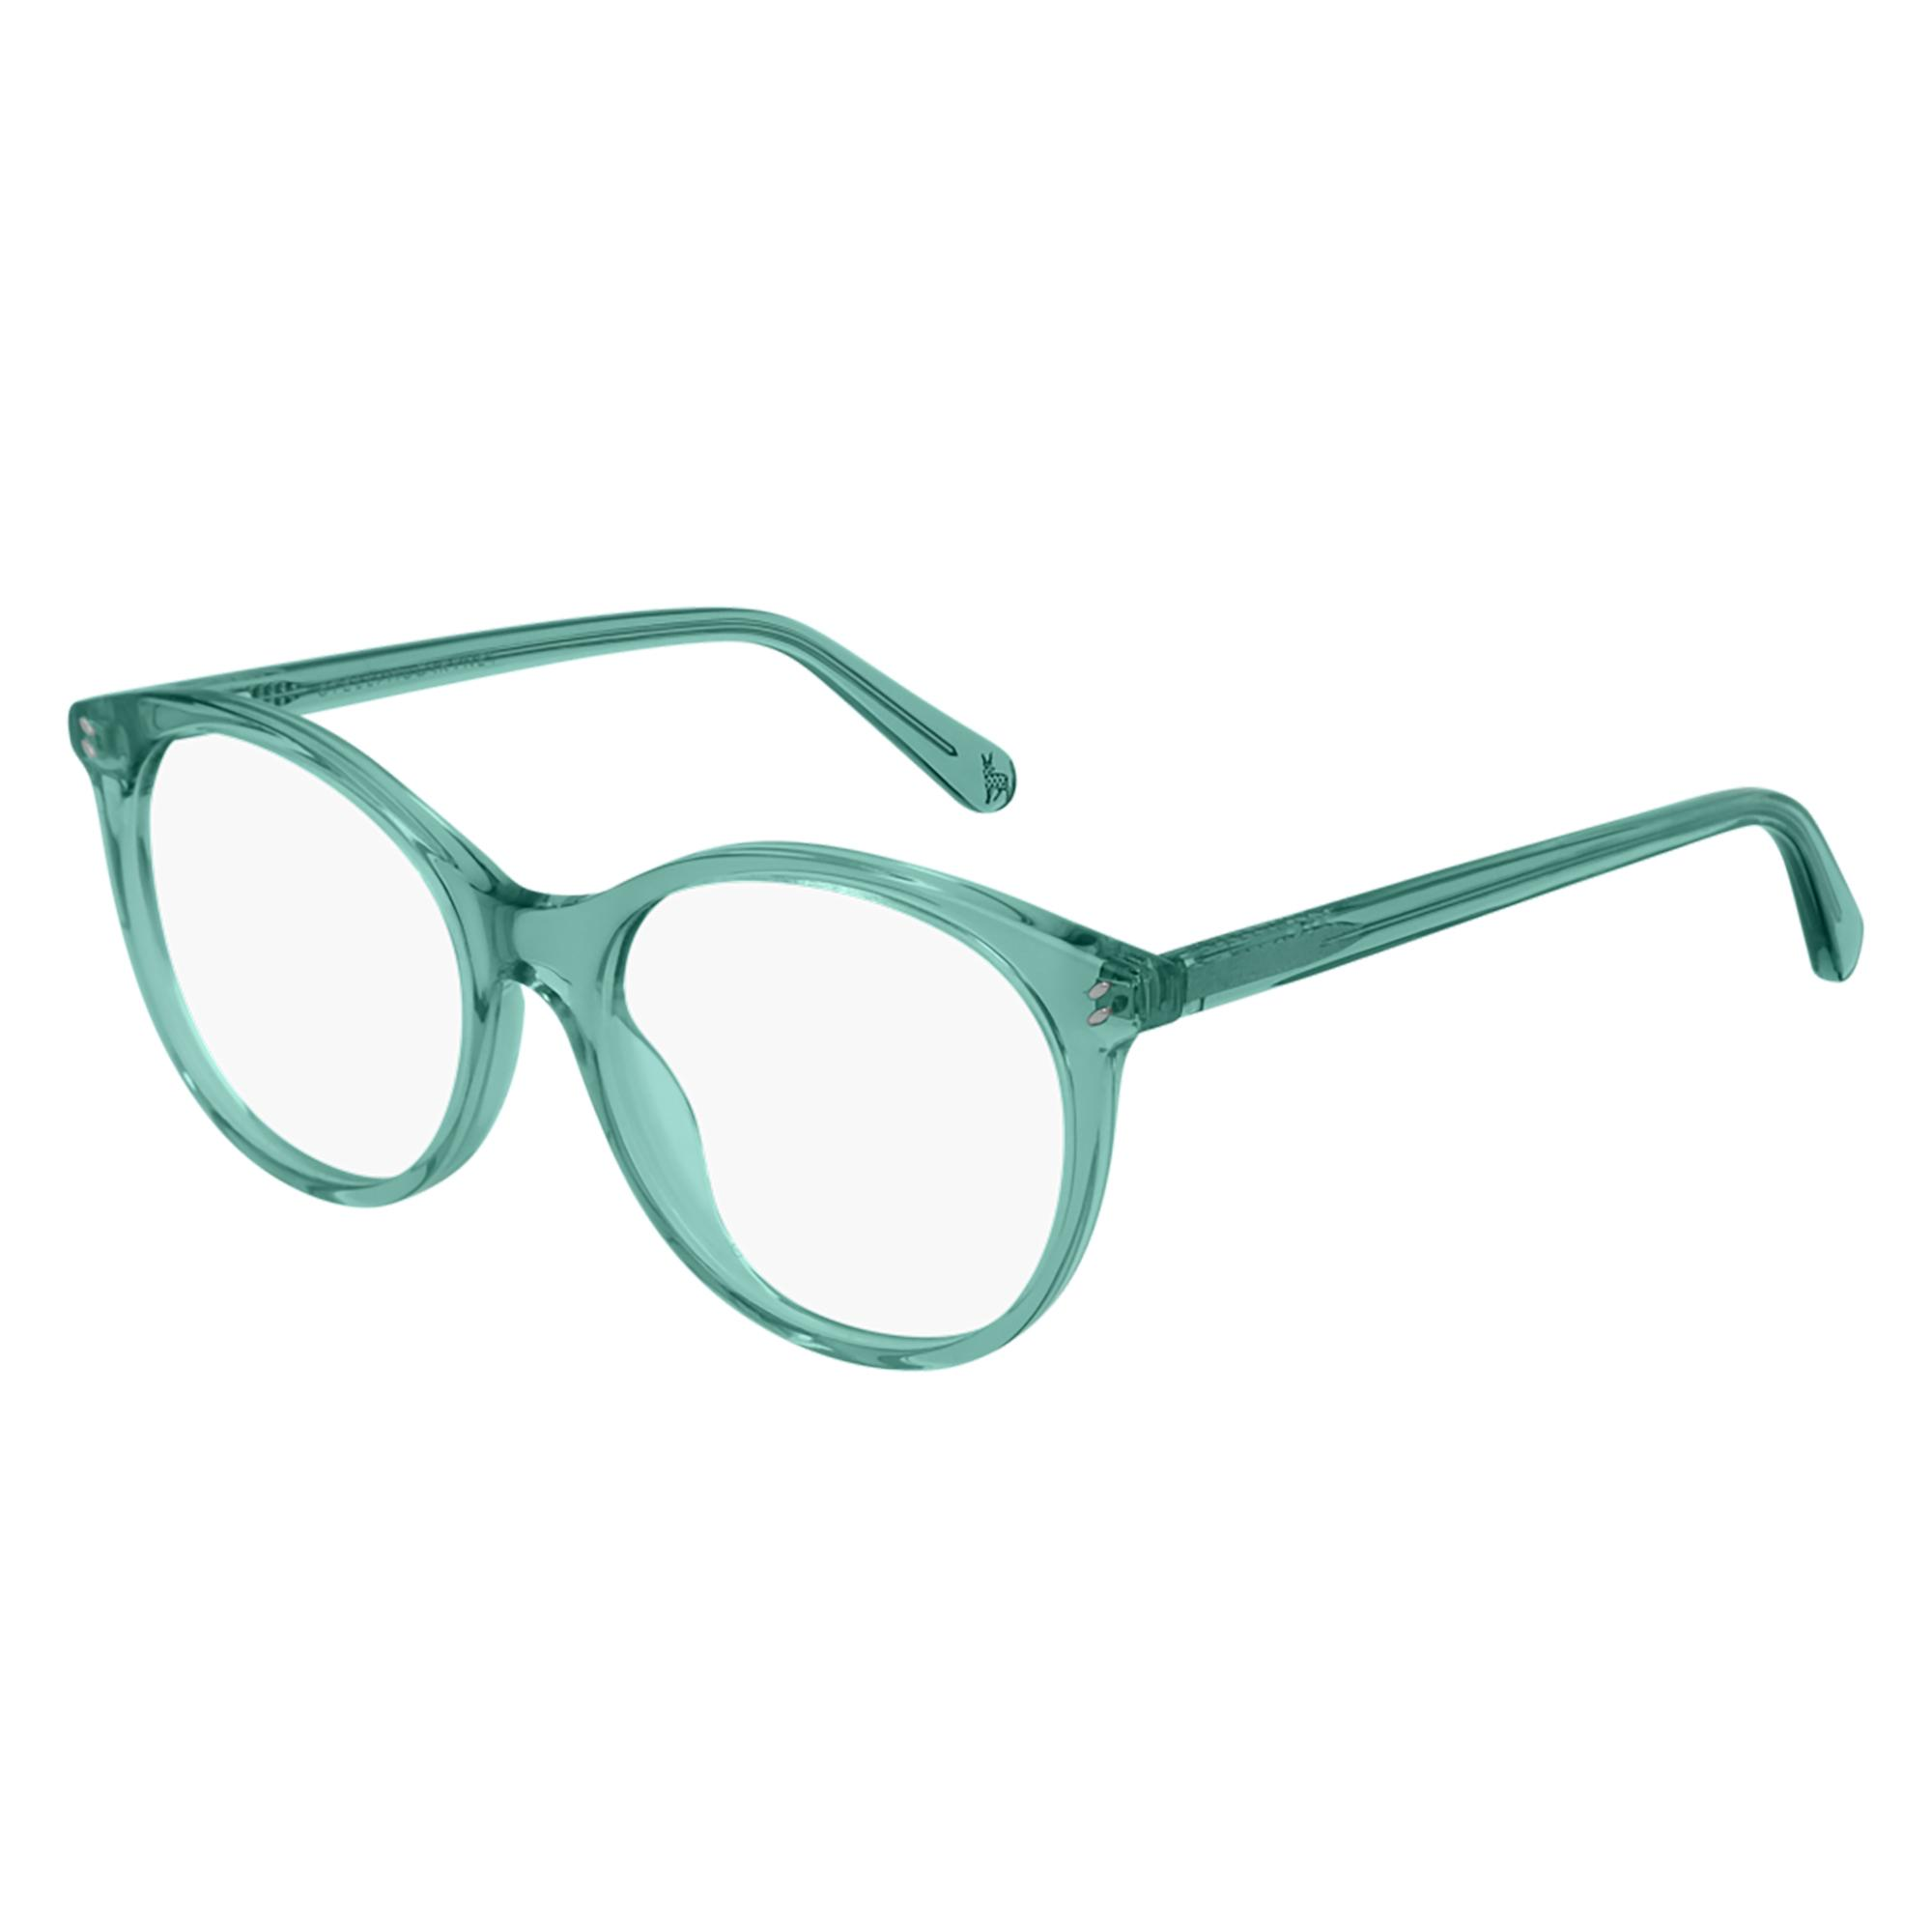 002 green green transpare